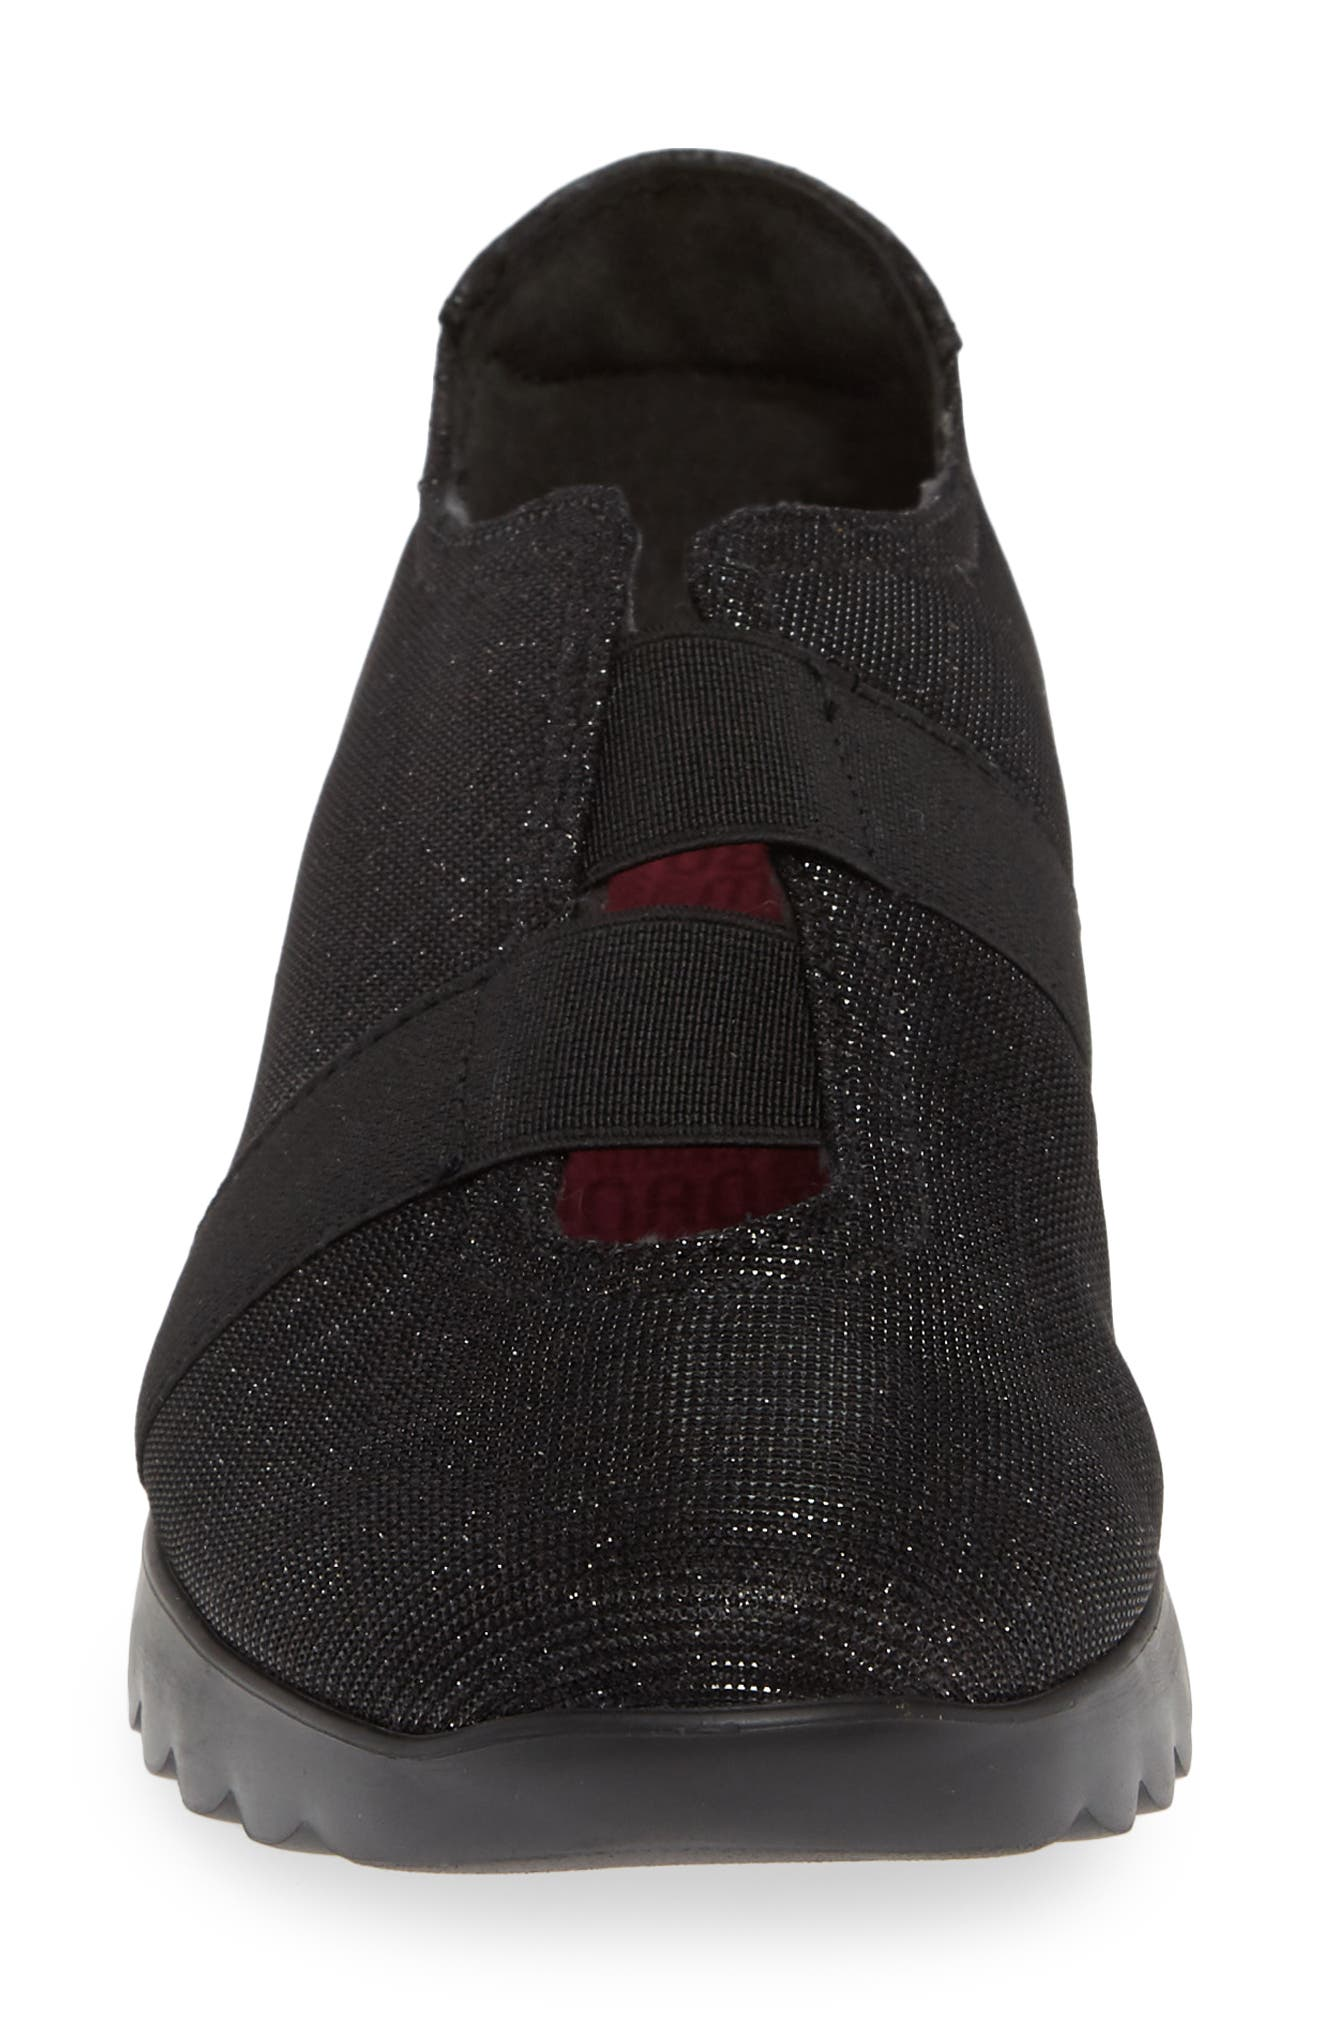 MUNRO, Alta Slip-On Sneaker, Alternate thumbnail 4, color, BLACK SPARKLE FABRIC